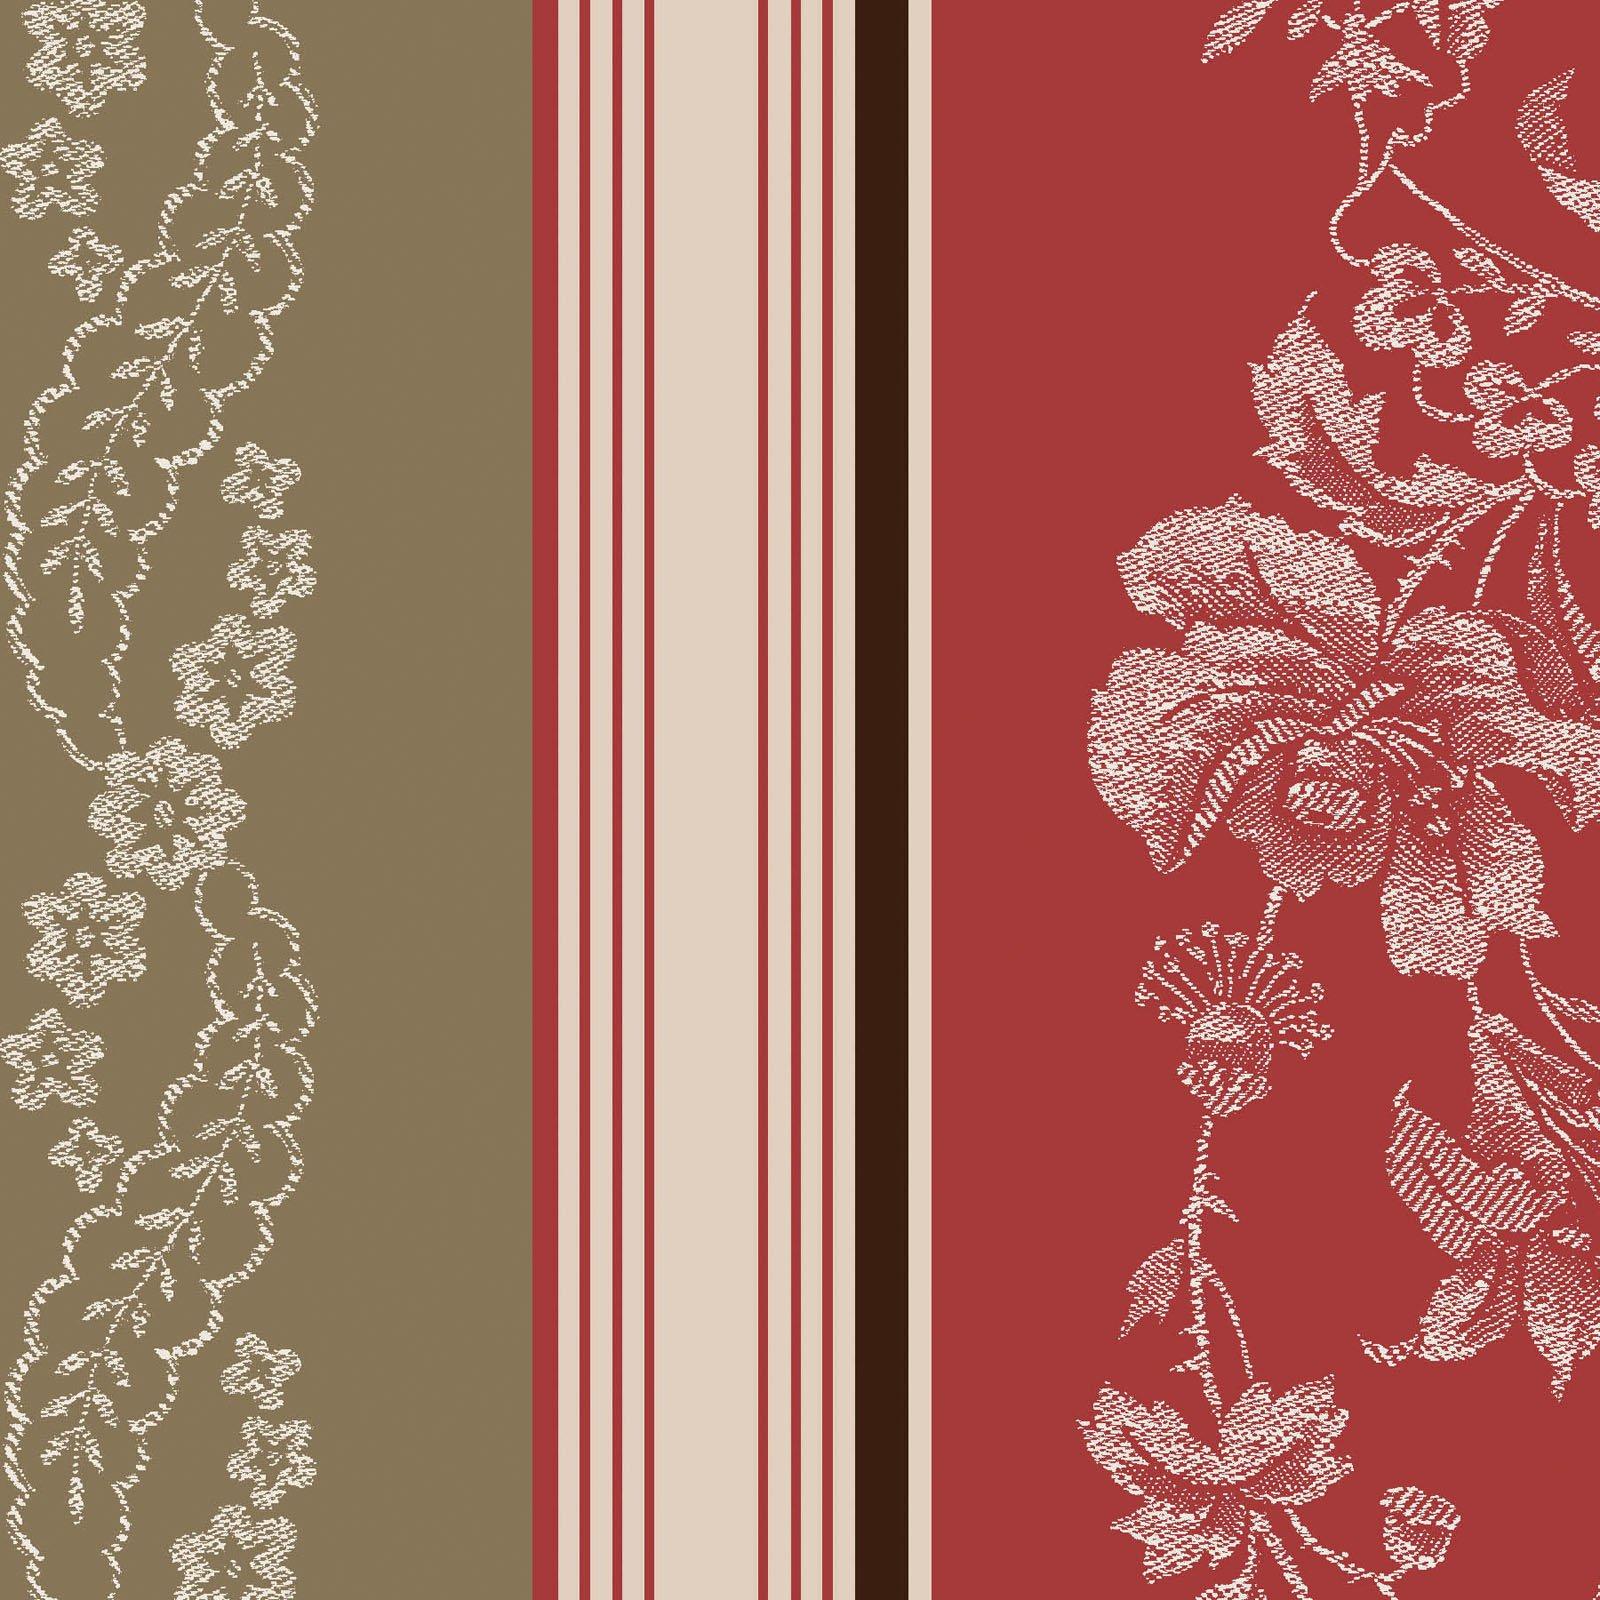 Ruby - Jacquard Texture Stripe - Tan/Red